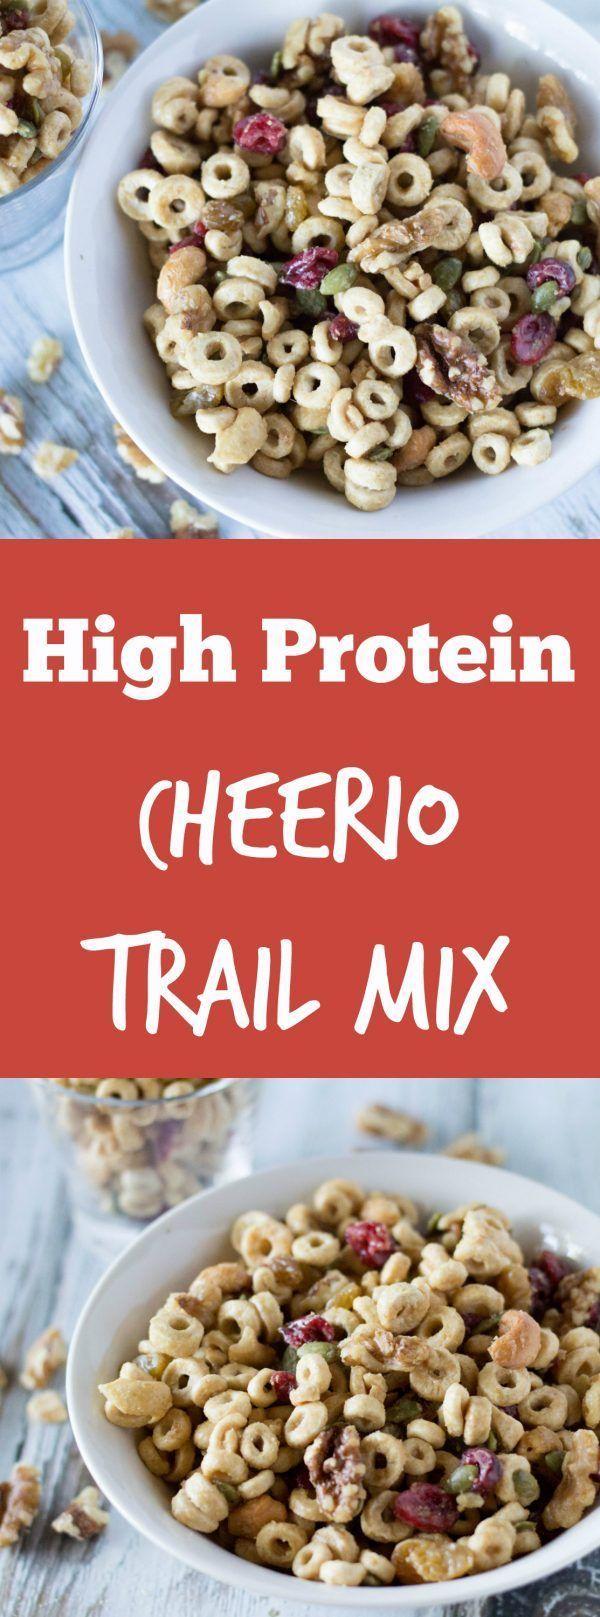 High Protein Cheerio Trail Mix